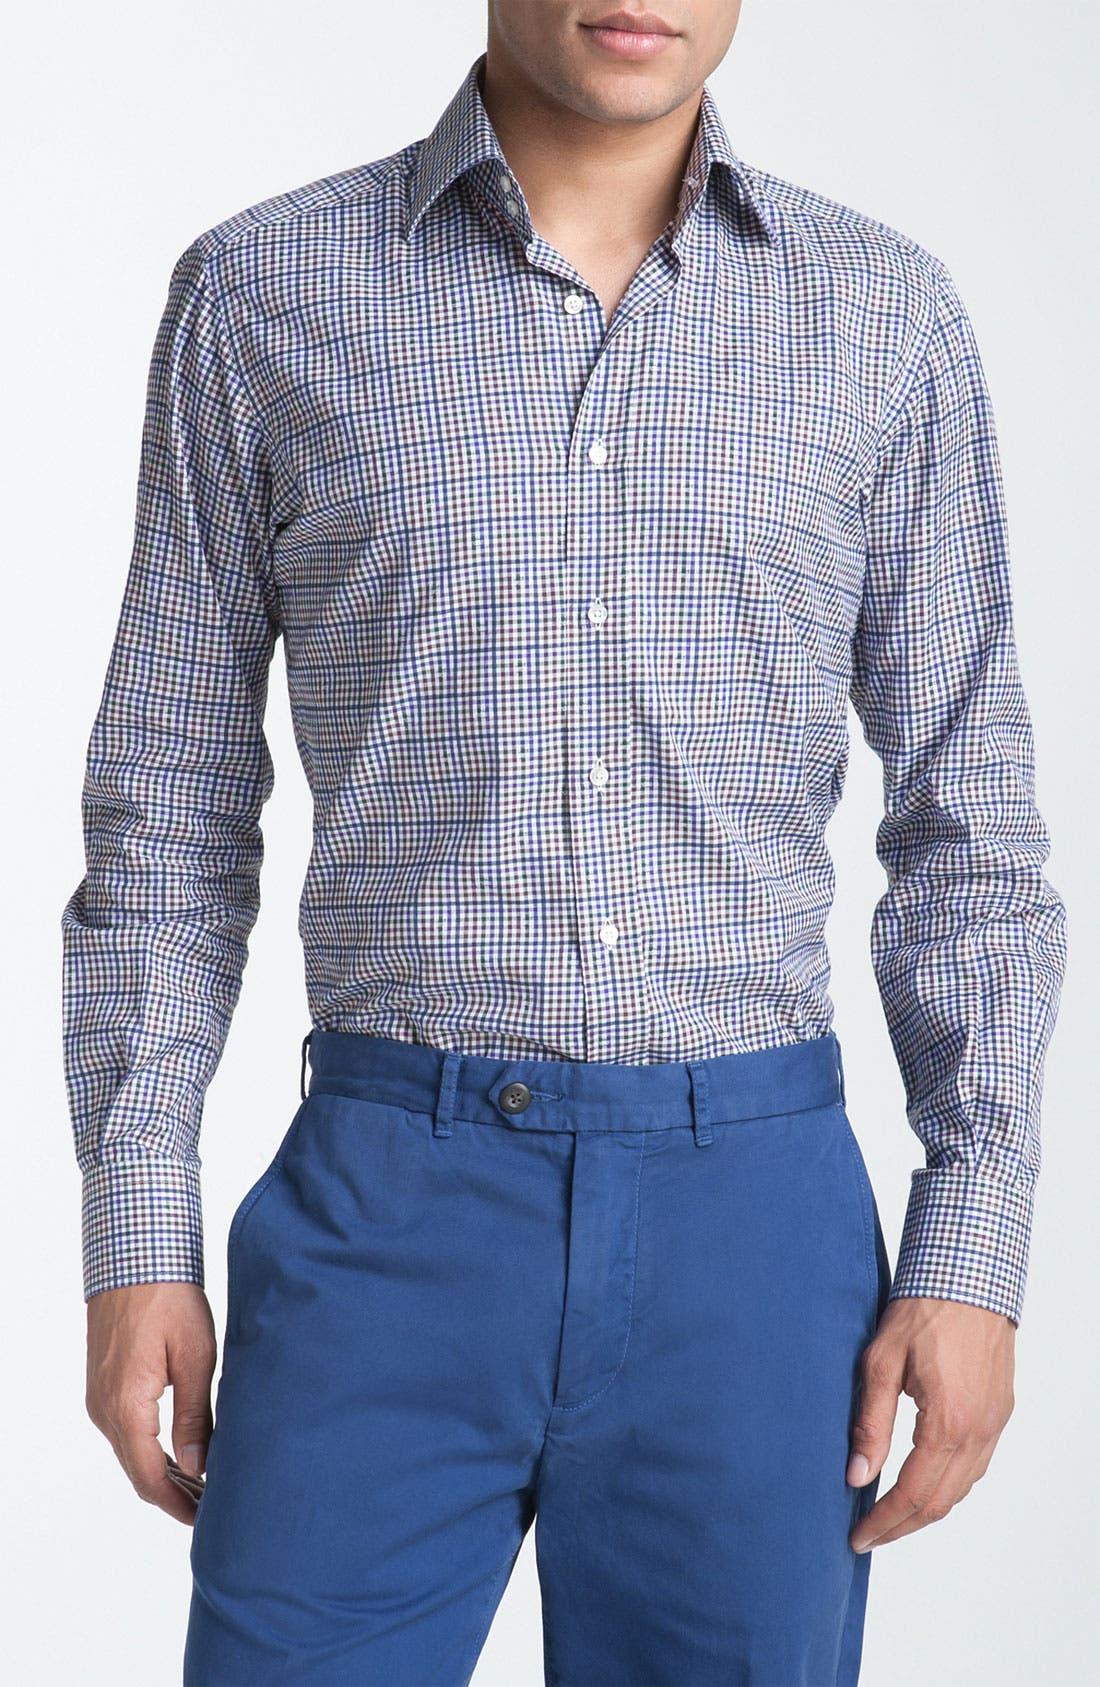 Main Image - Etro Plaid Woven Dress Shirt